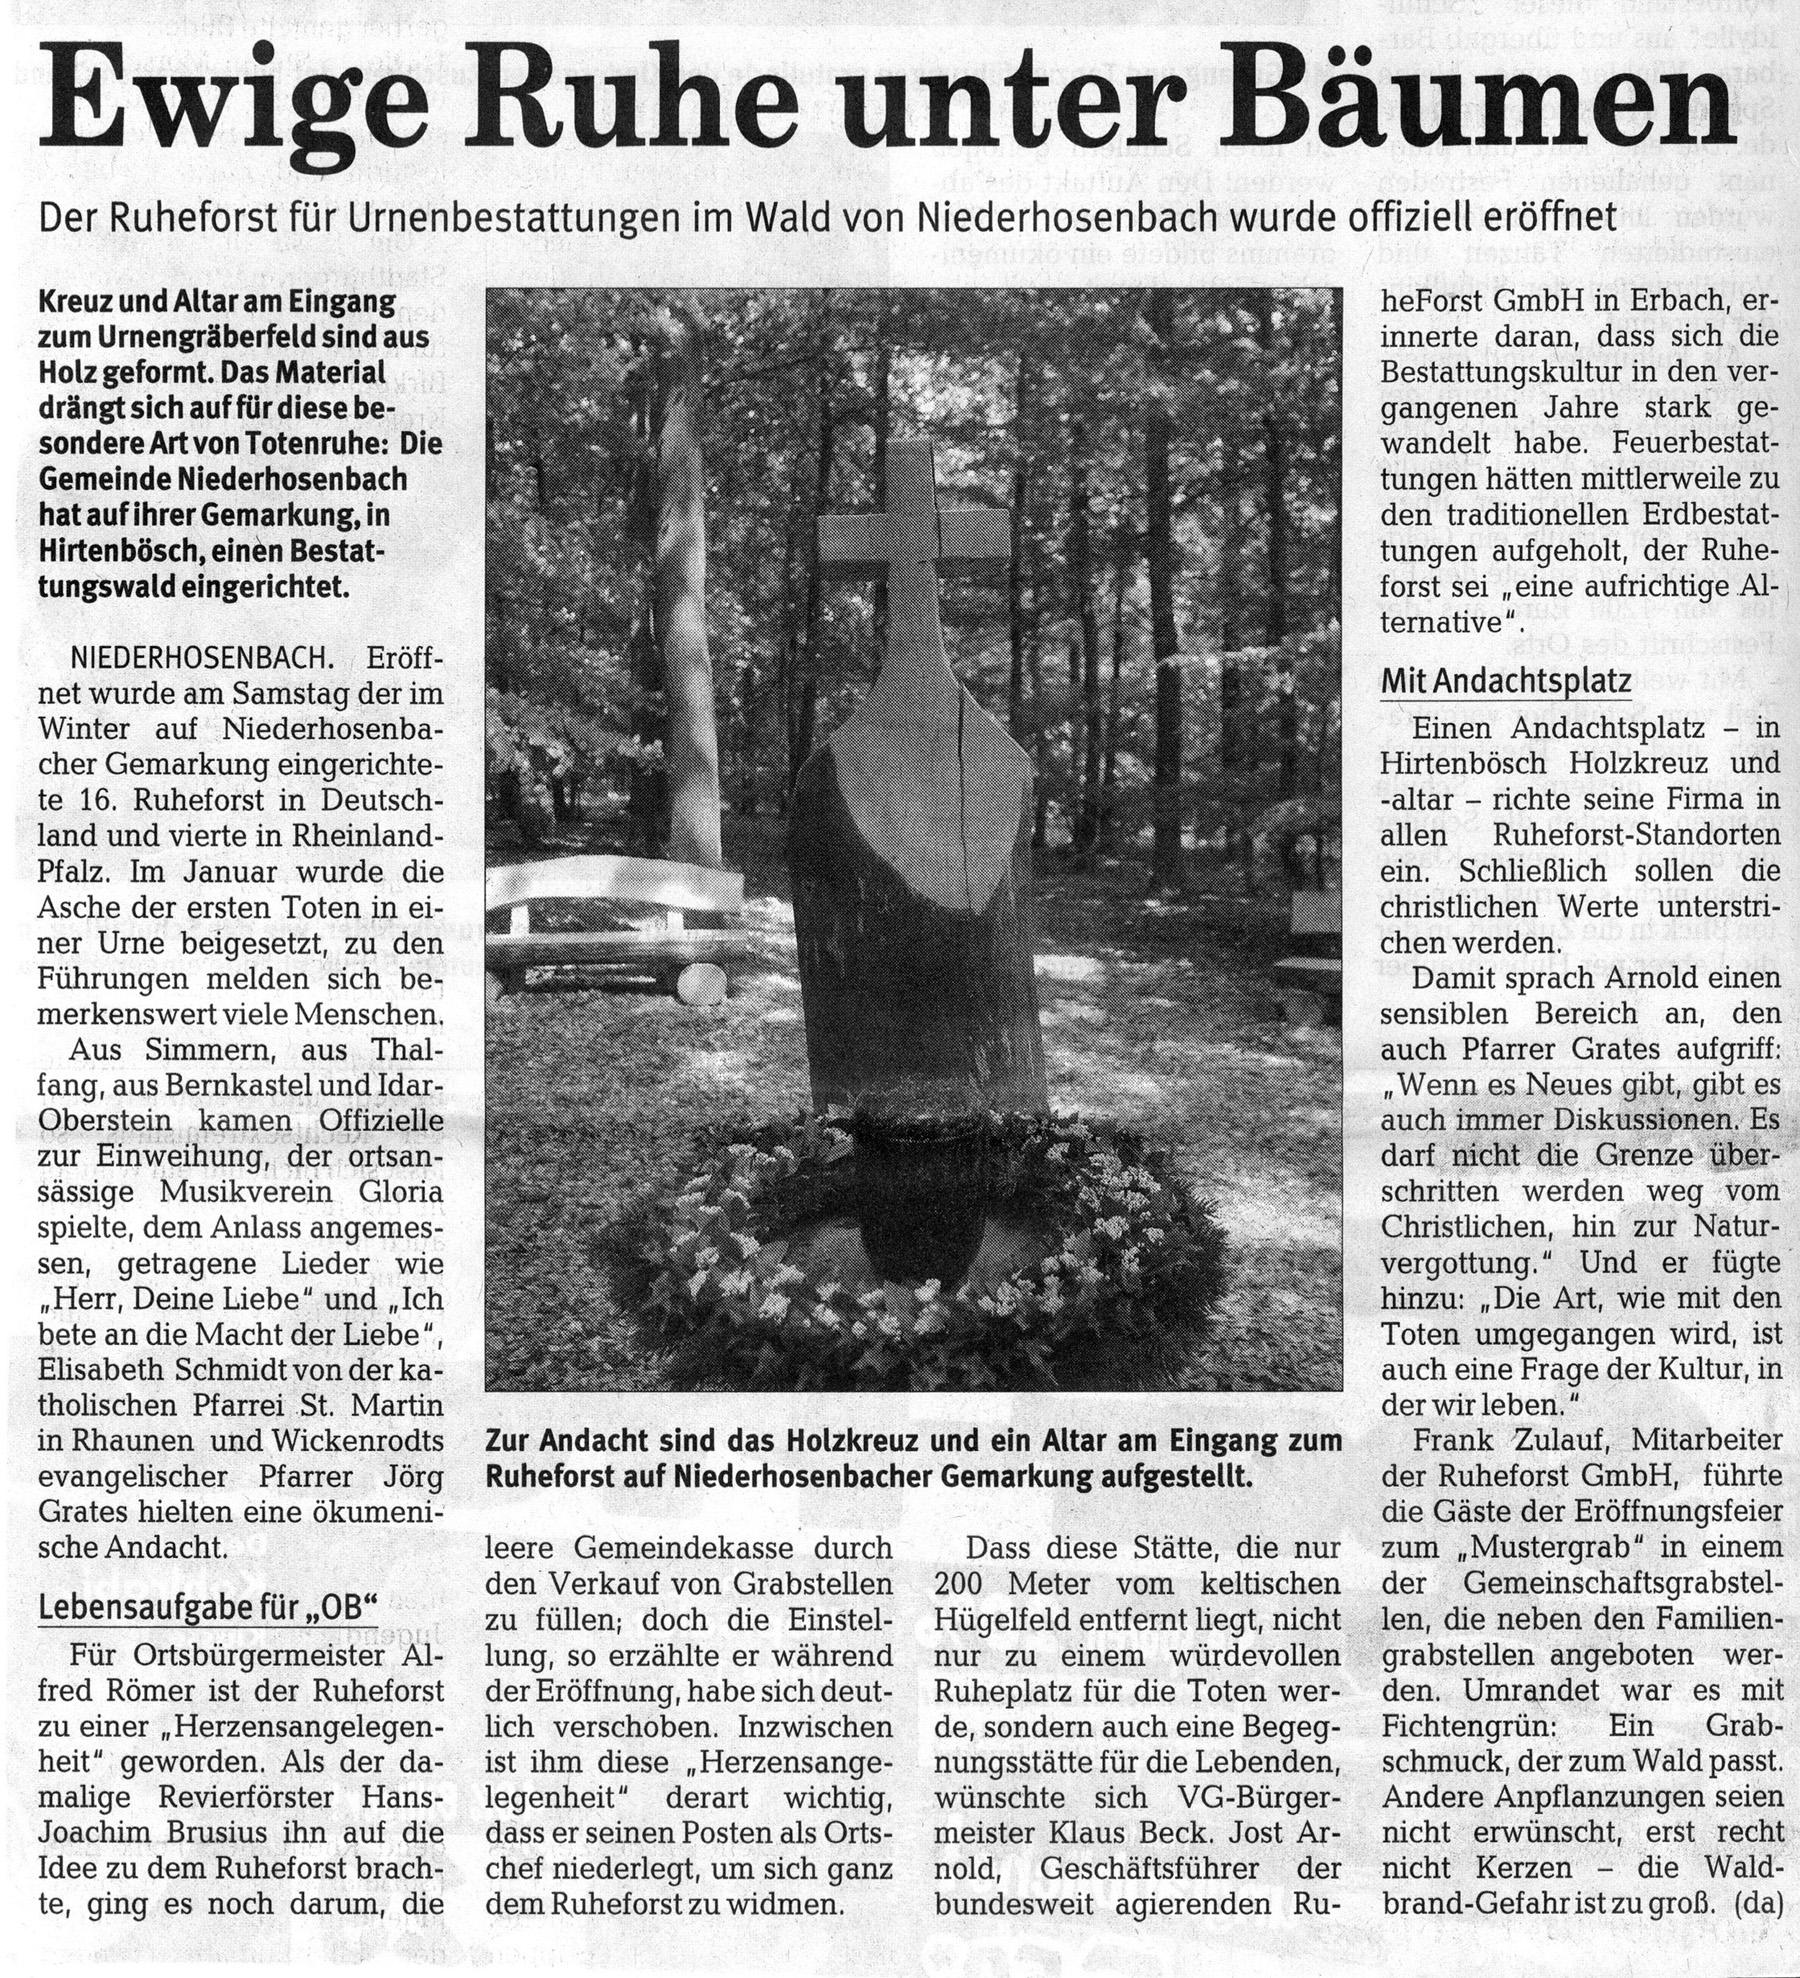 2007.05.14. Nahe-Zeitung (2)